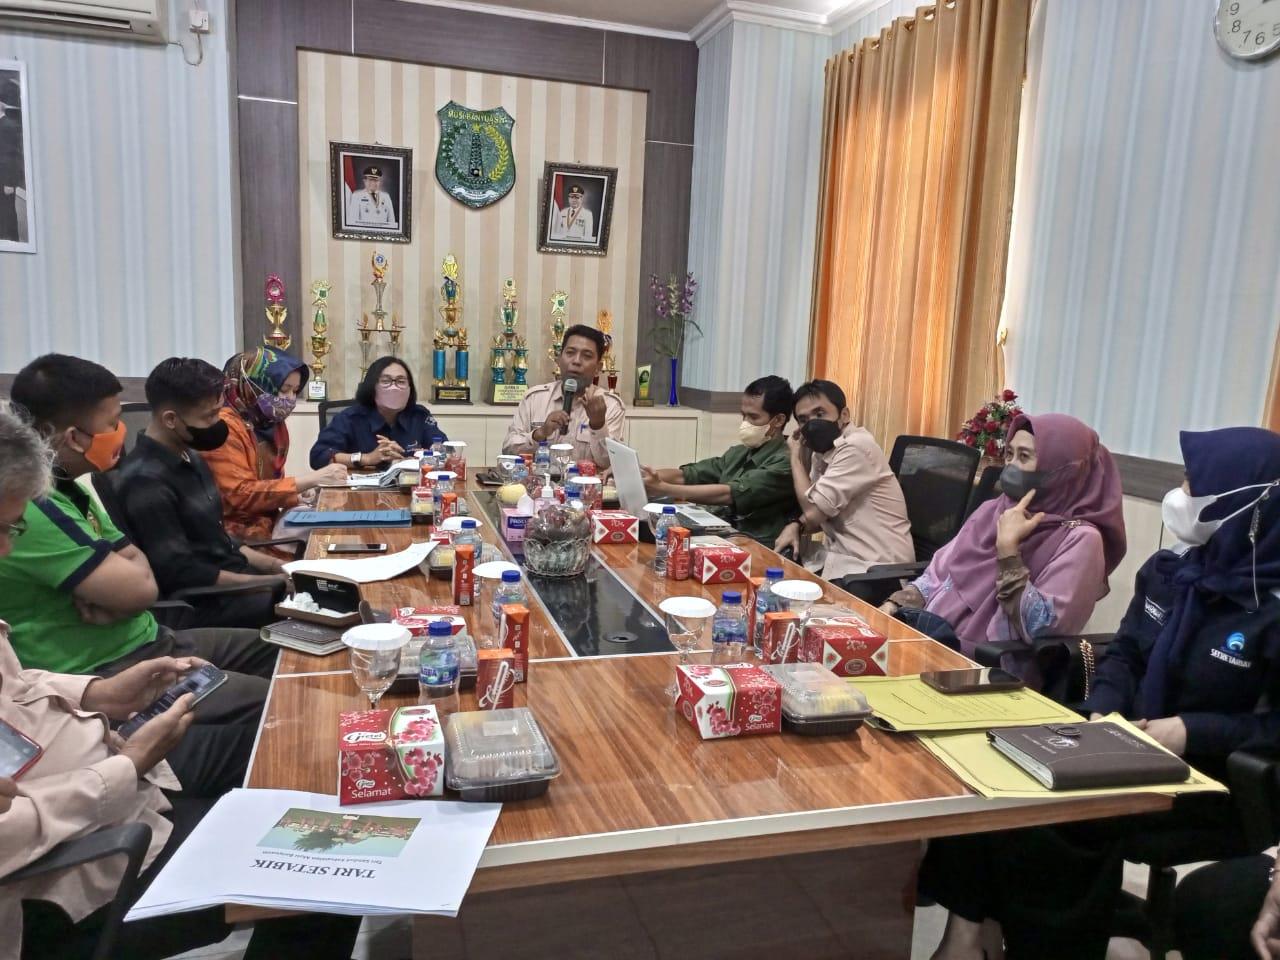 Pemkab Muba mengusulkan Tari Setabik, Andai-Andai Panjang, makanan khas Gula Palu, dan Sagon sebagai Warisan Budaya Tak Benda (WBTB) Indonesia Provinsi Sumatera Selatan tahun 2021